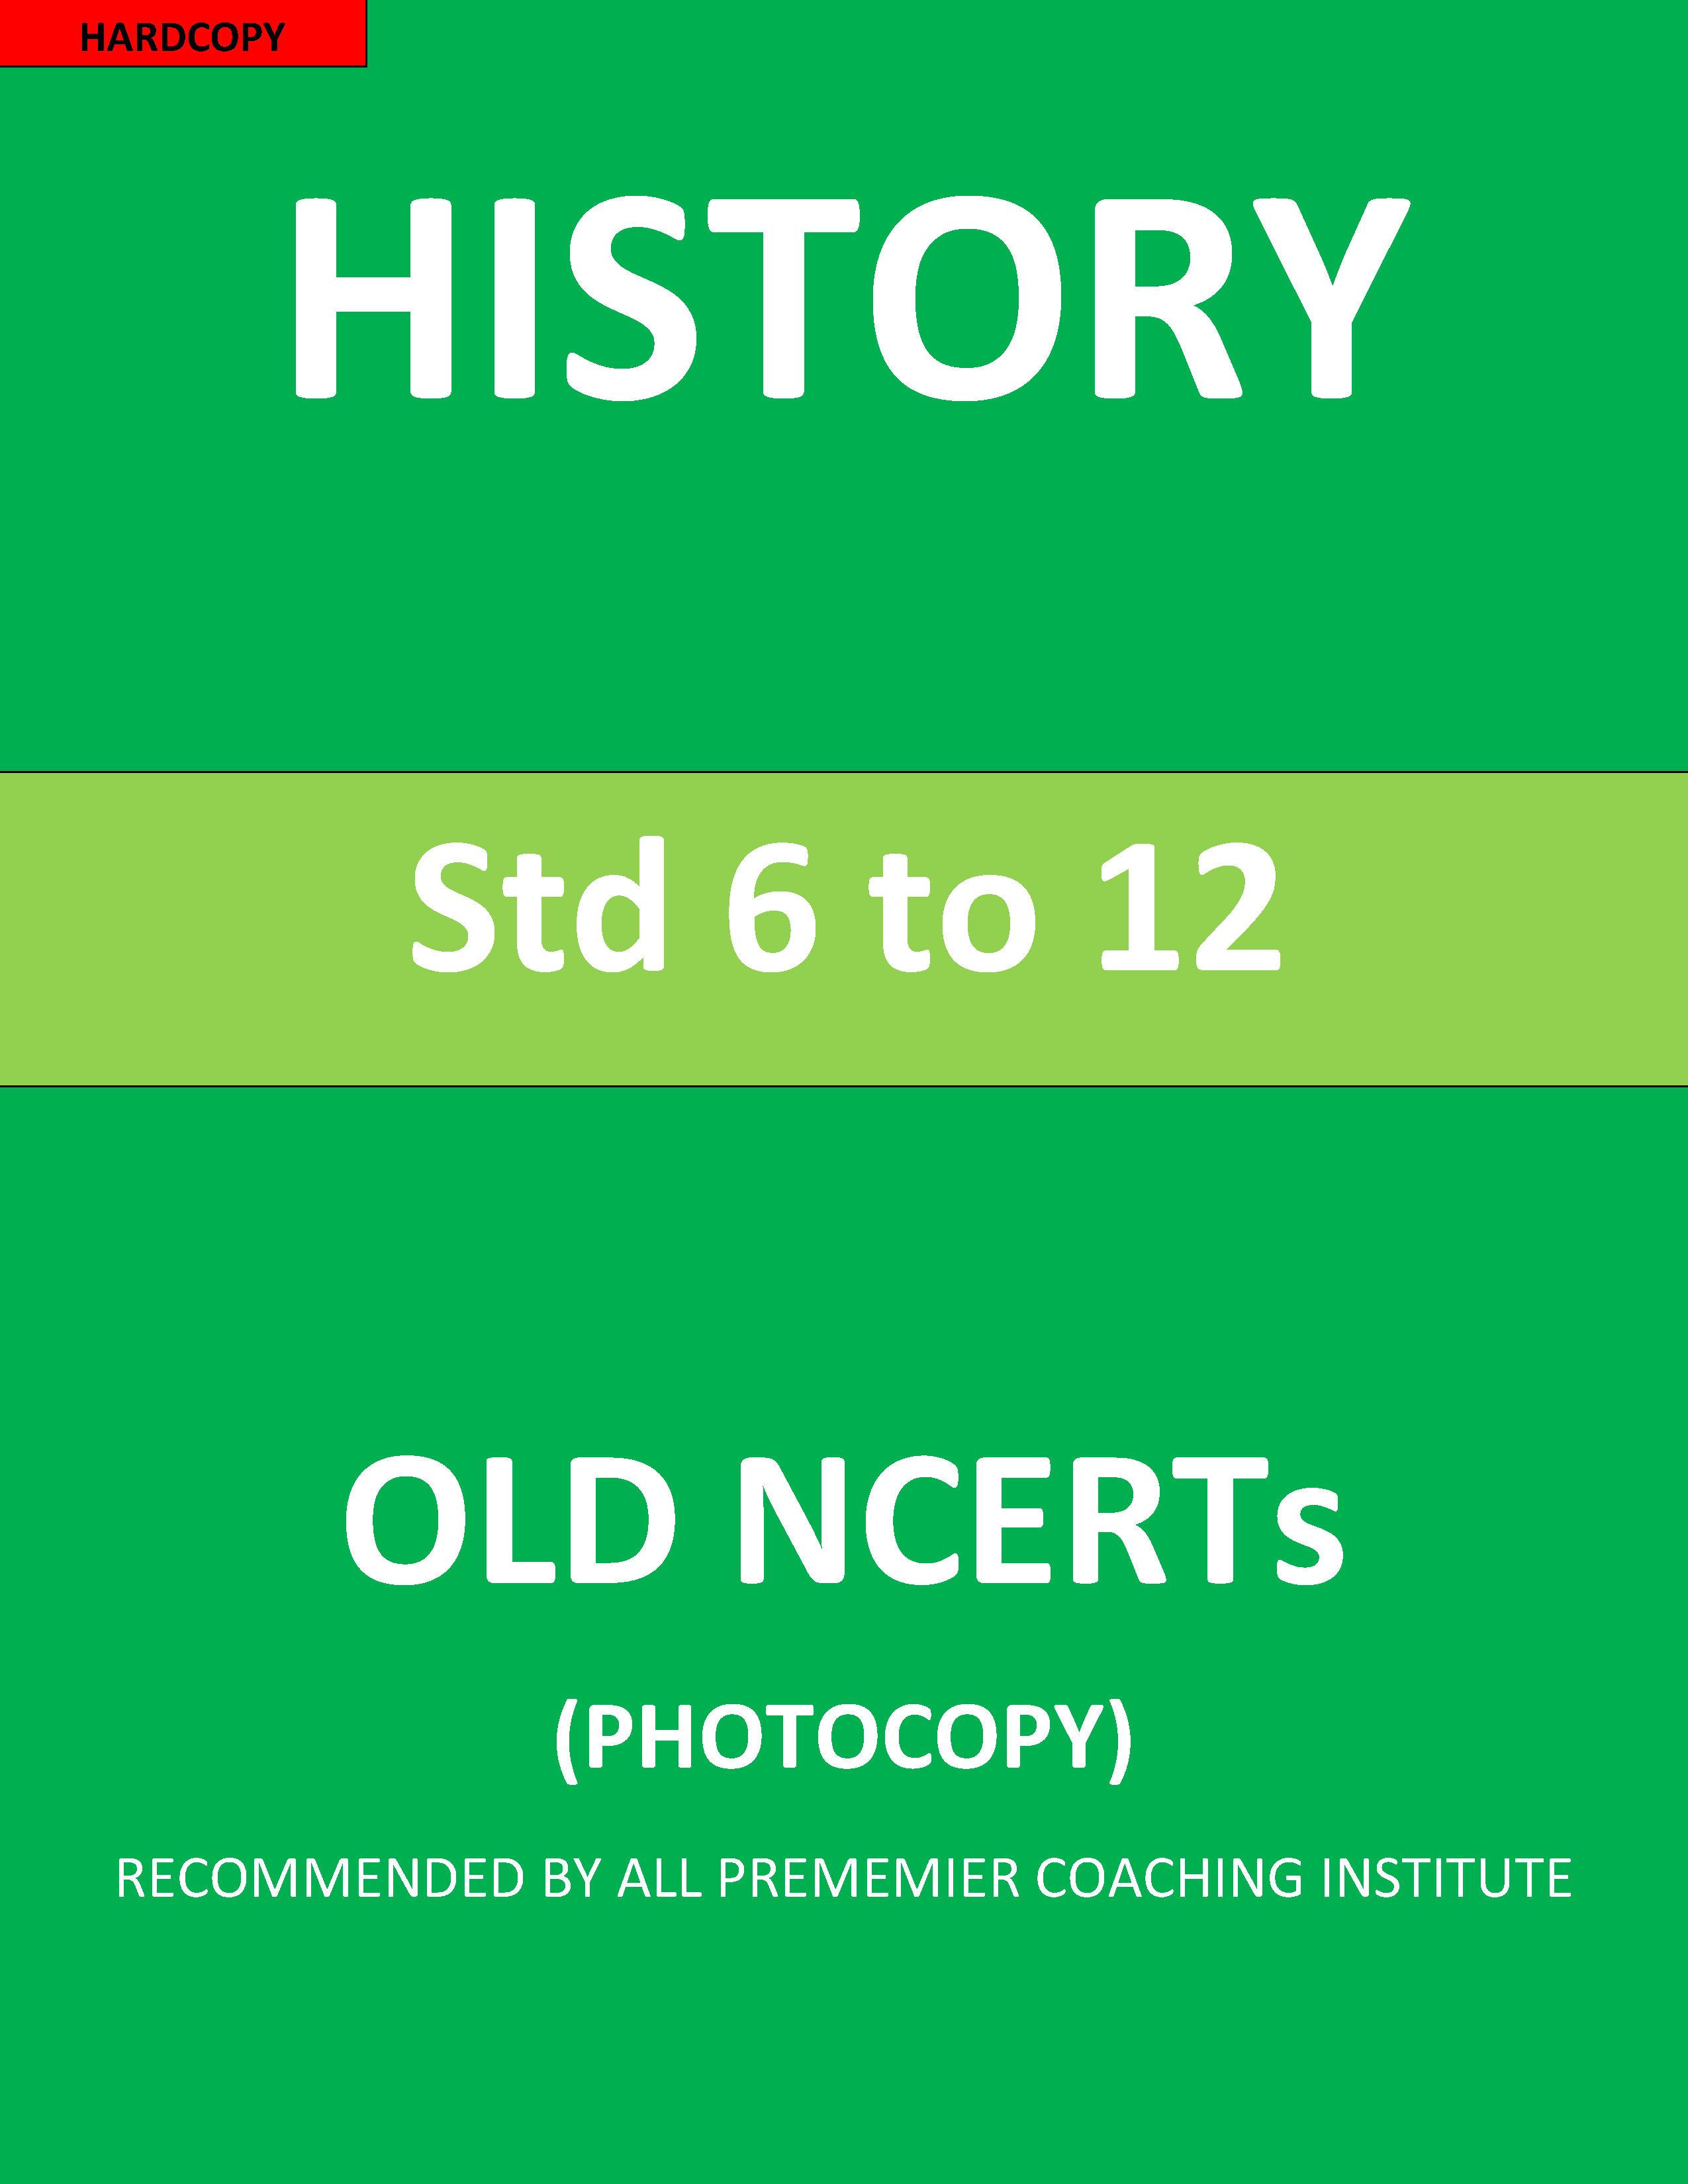 OLD NCERT WORLD HISTORY EBOOK